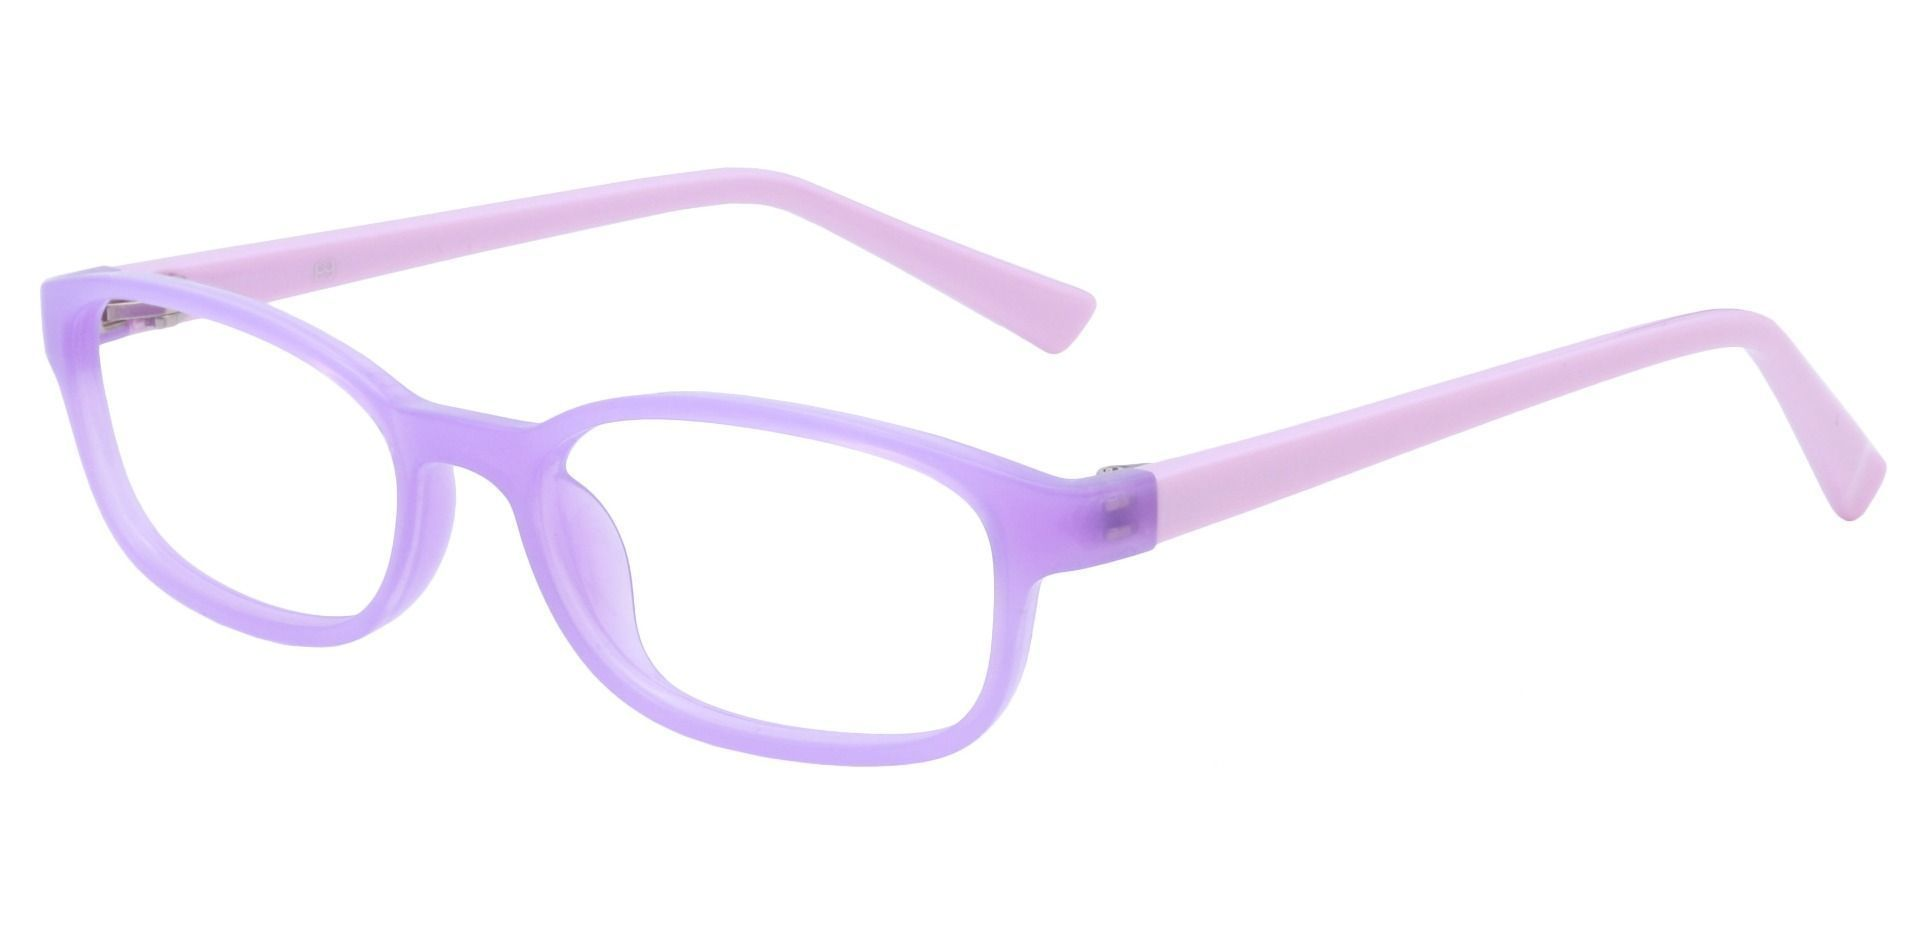 Kia Oval Single Vision Glasses - Orchid